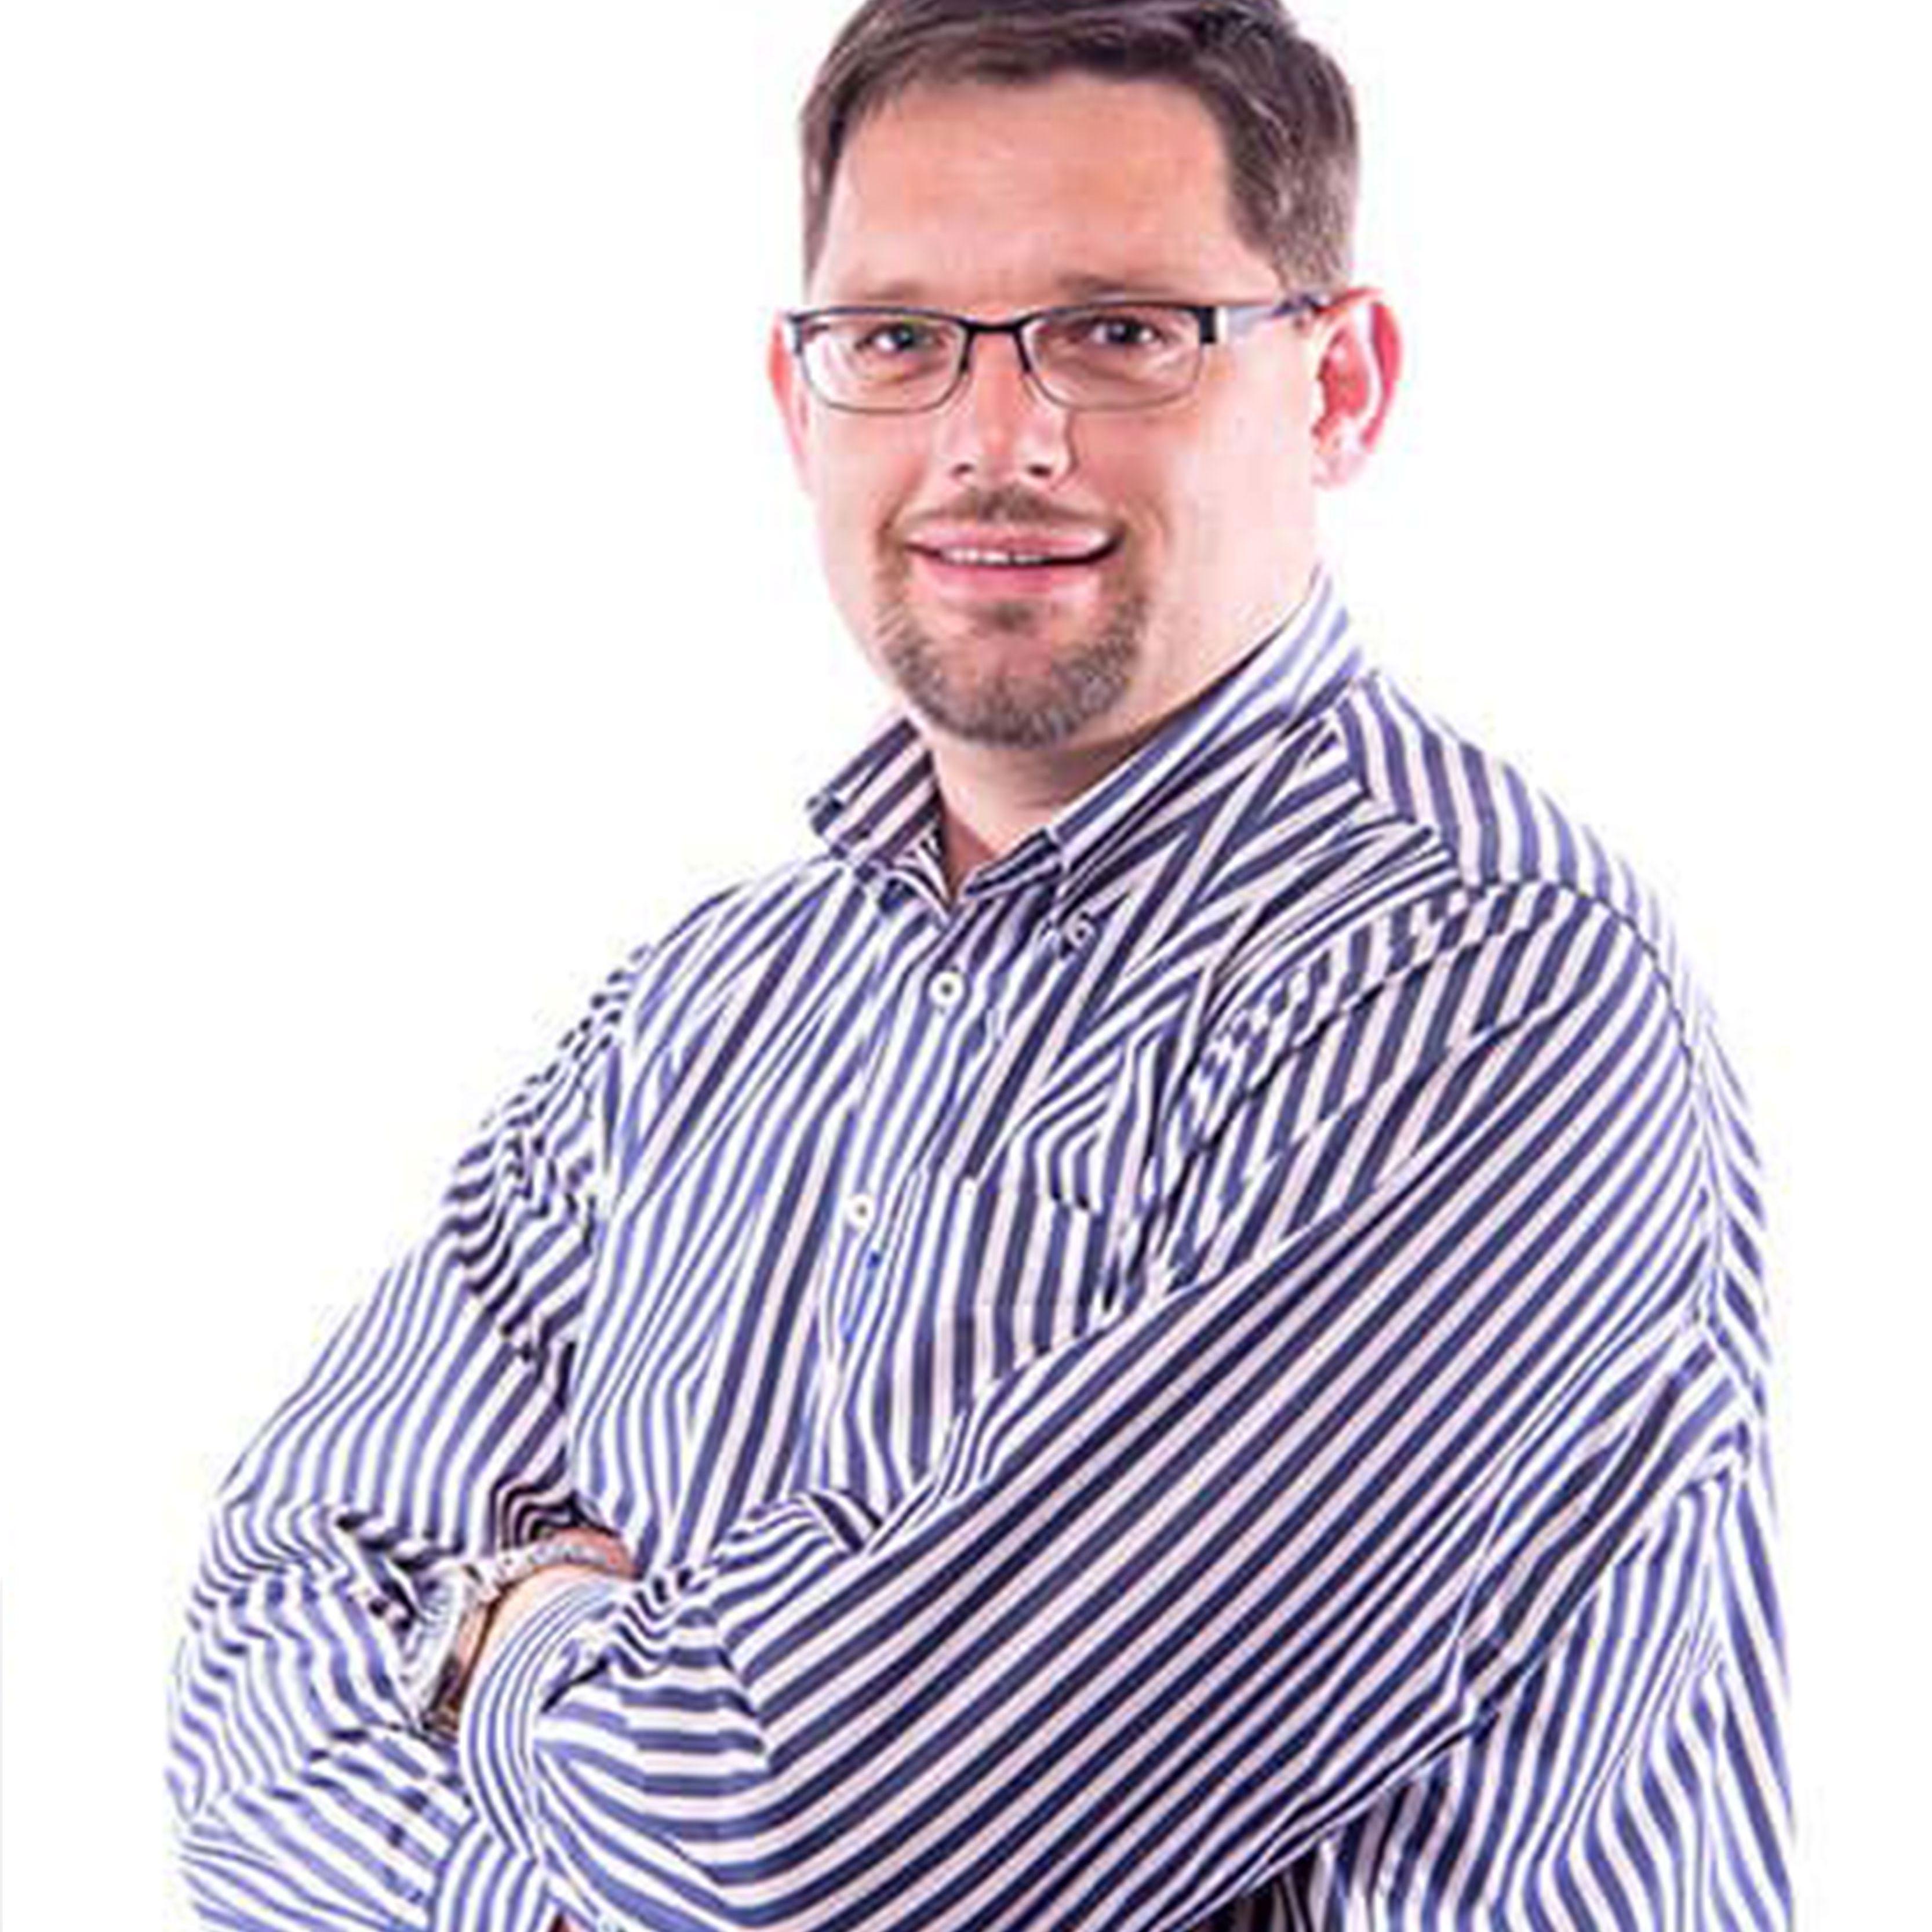 Profile photo of Gerhard Pretorius, Nutrition Executive at Astral Foods